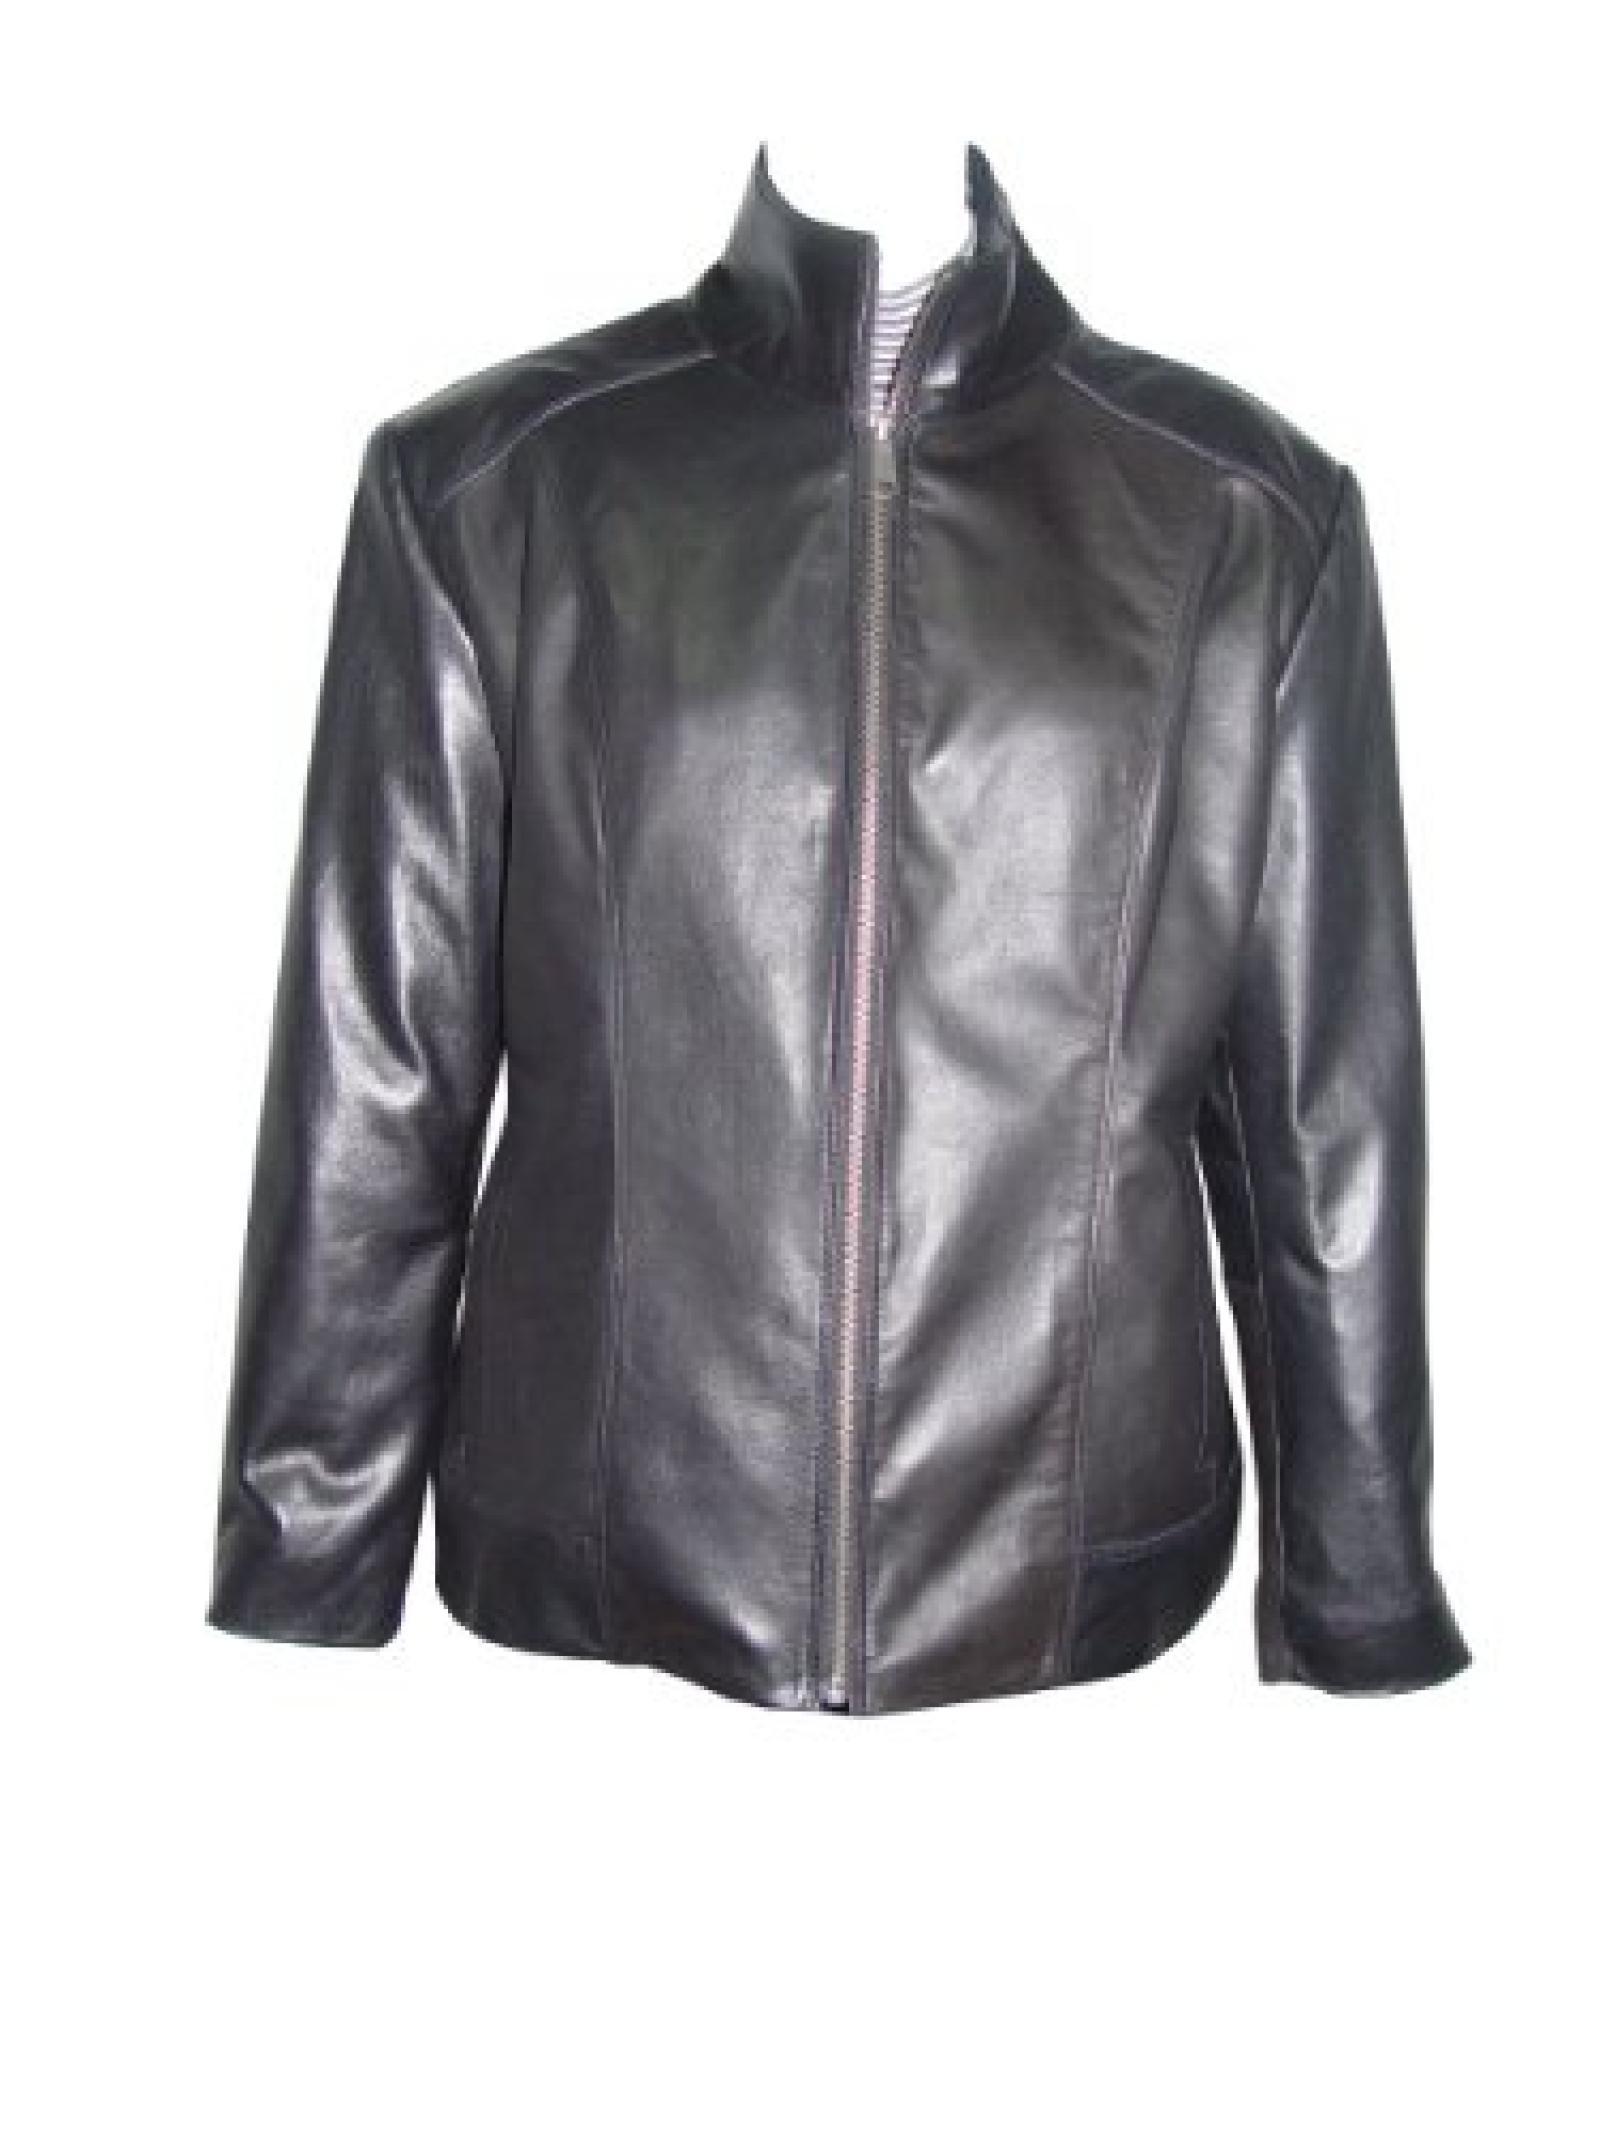 Nettailor Women PLUS SIZE 4198 Soft Leather New Casual Biker Jacket Zip Front